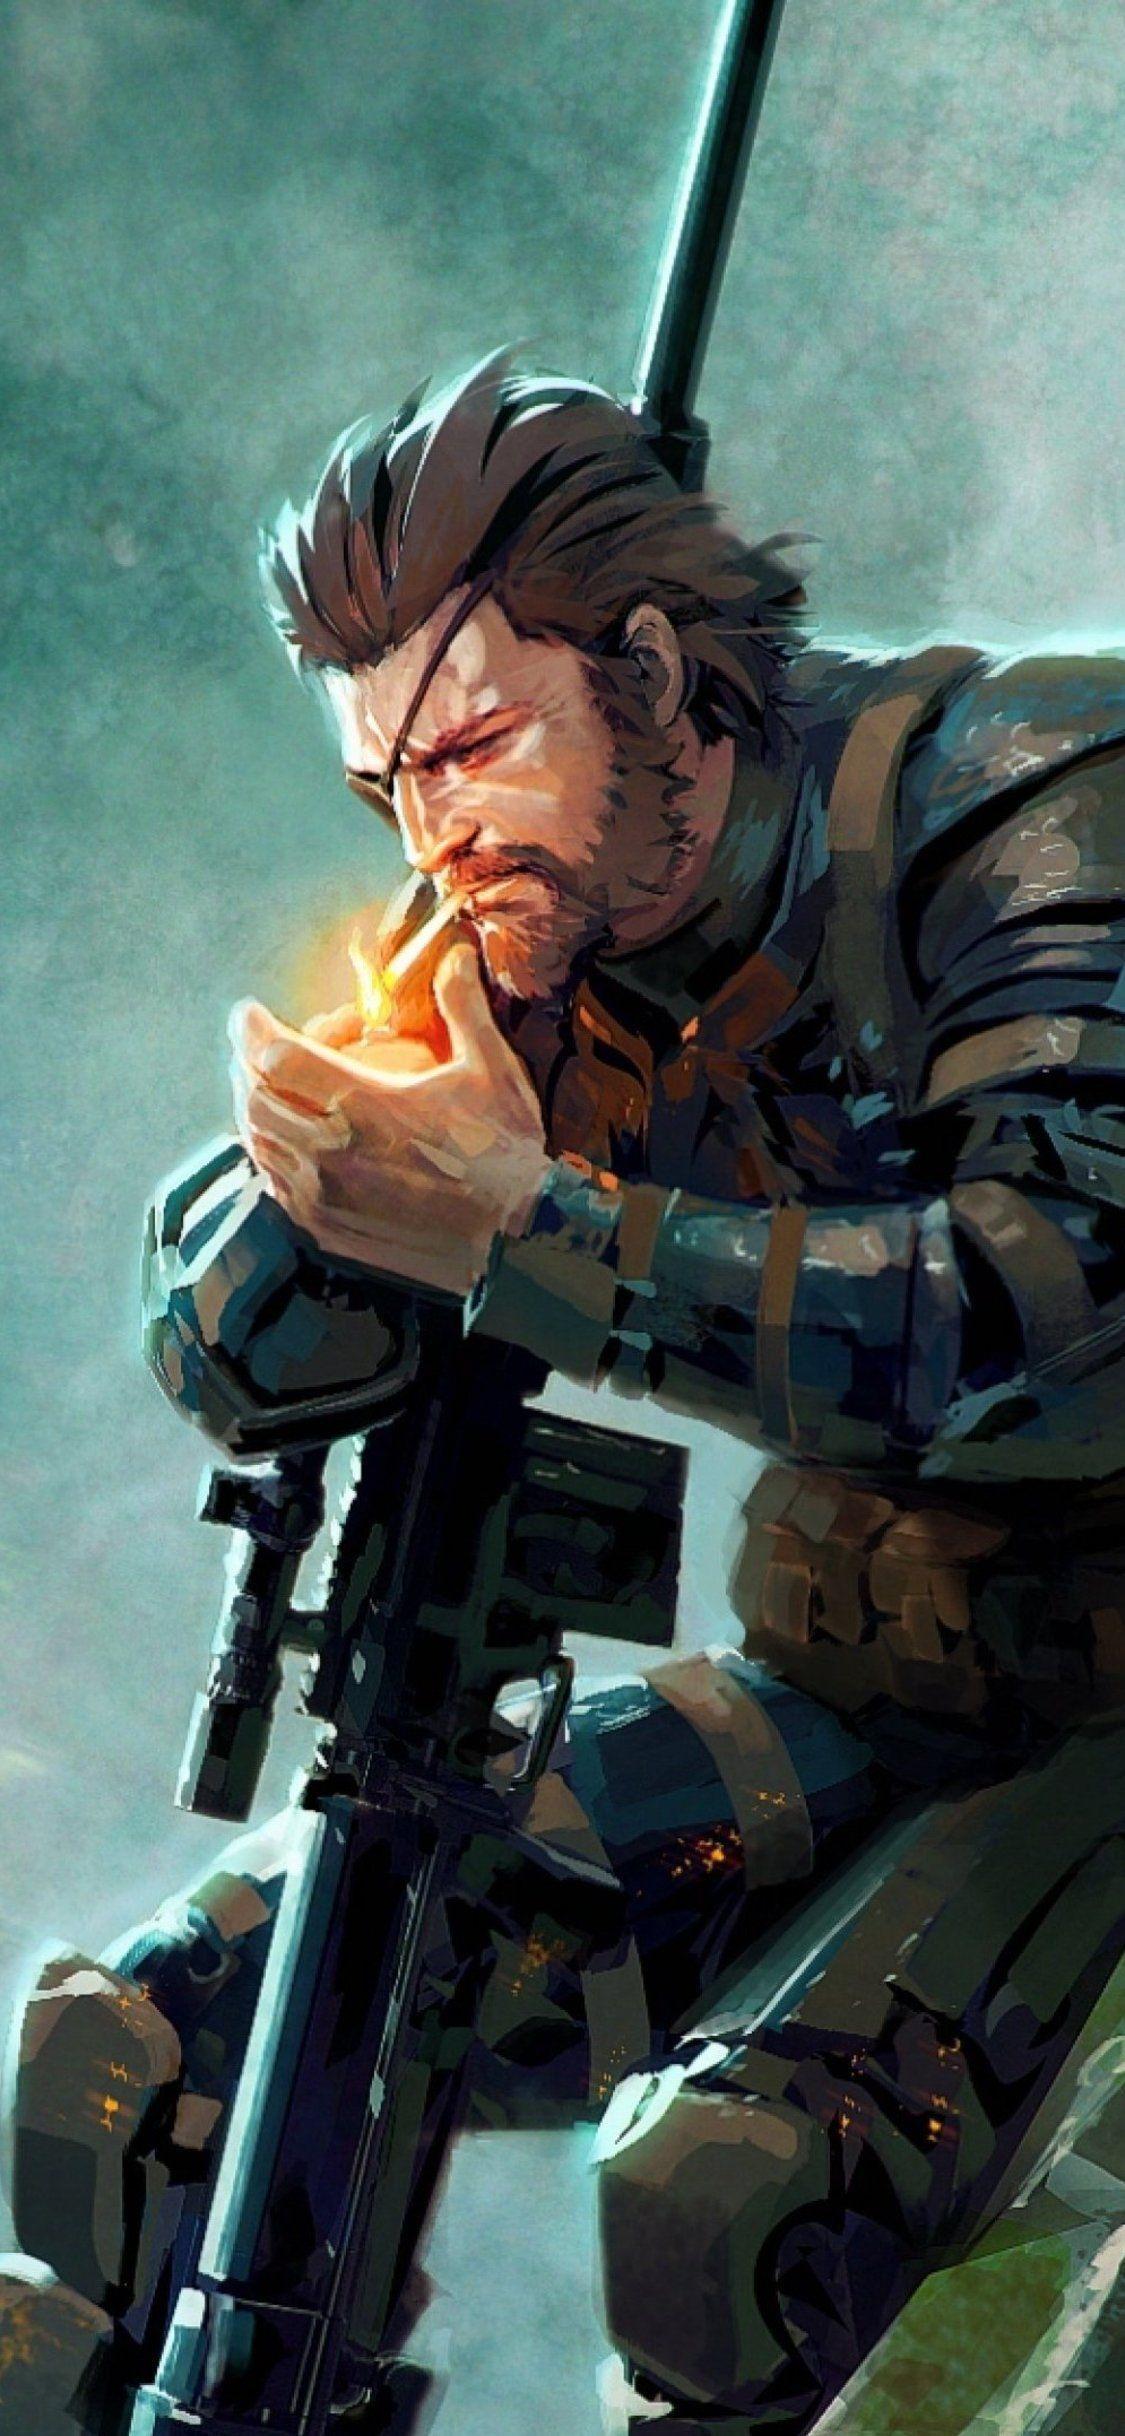 Metal Gear Iphone Wallpapers Top Free Metal Gear Iphone